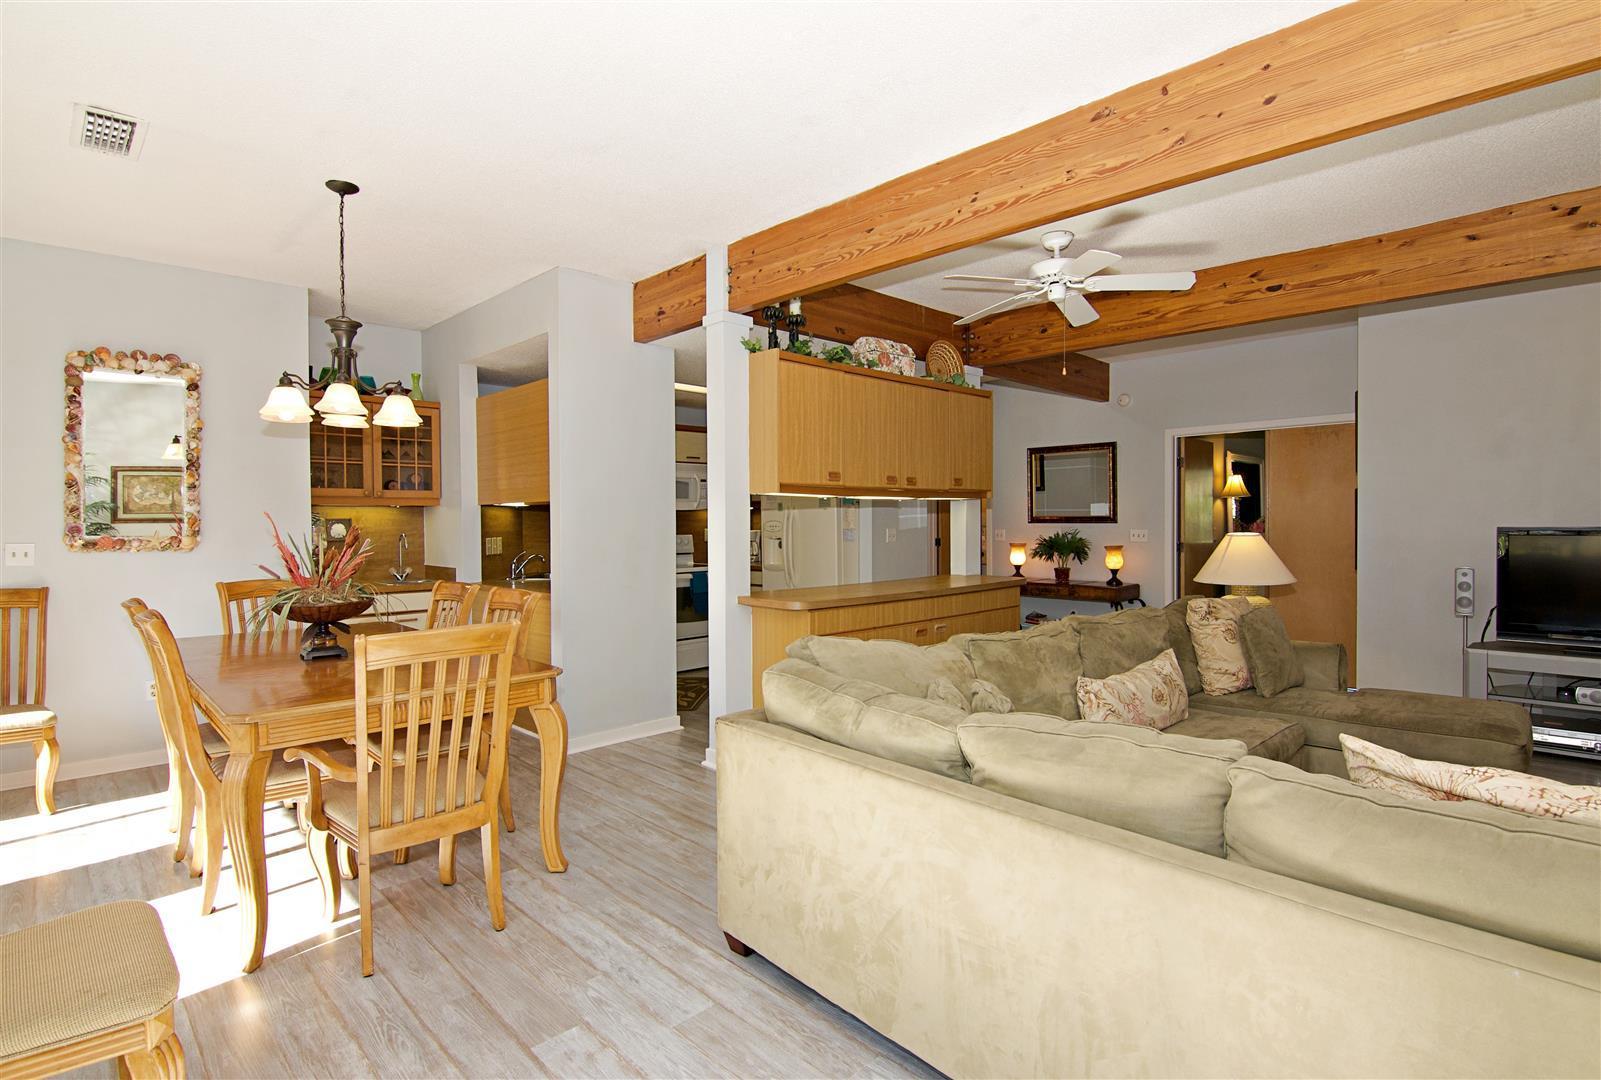 Seabrook Island Homes For Sale - 3020 Ocean Winds, Seabrook Island, SC - 33